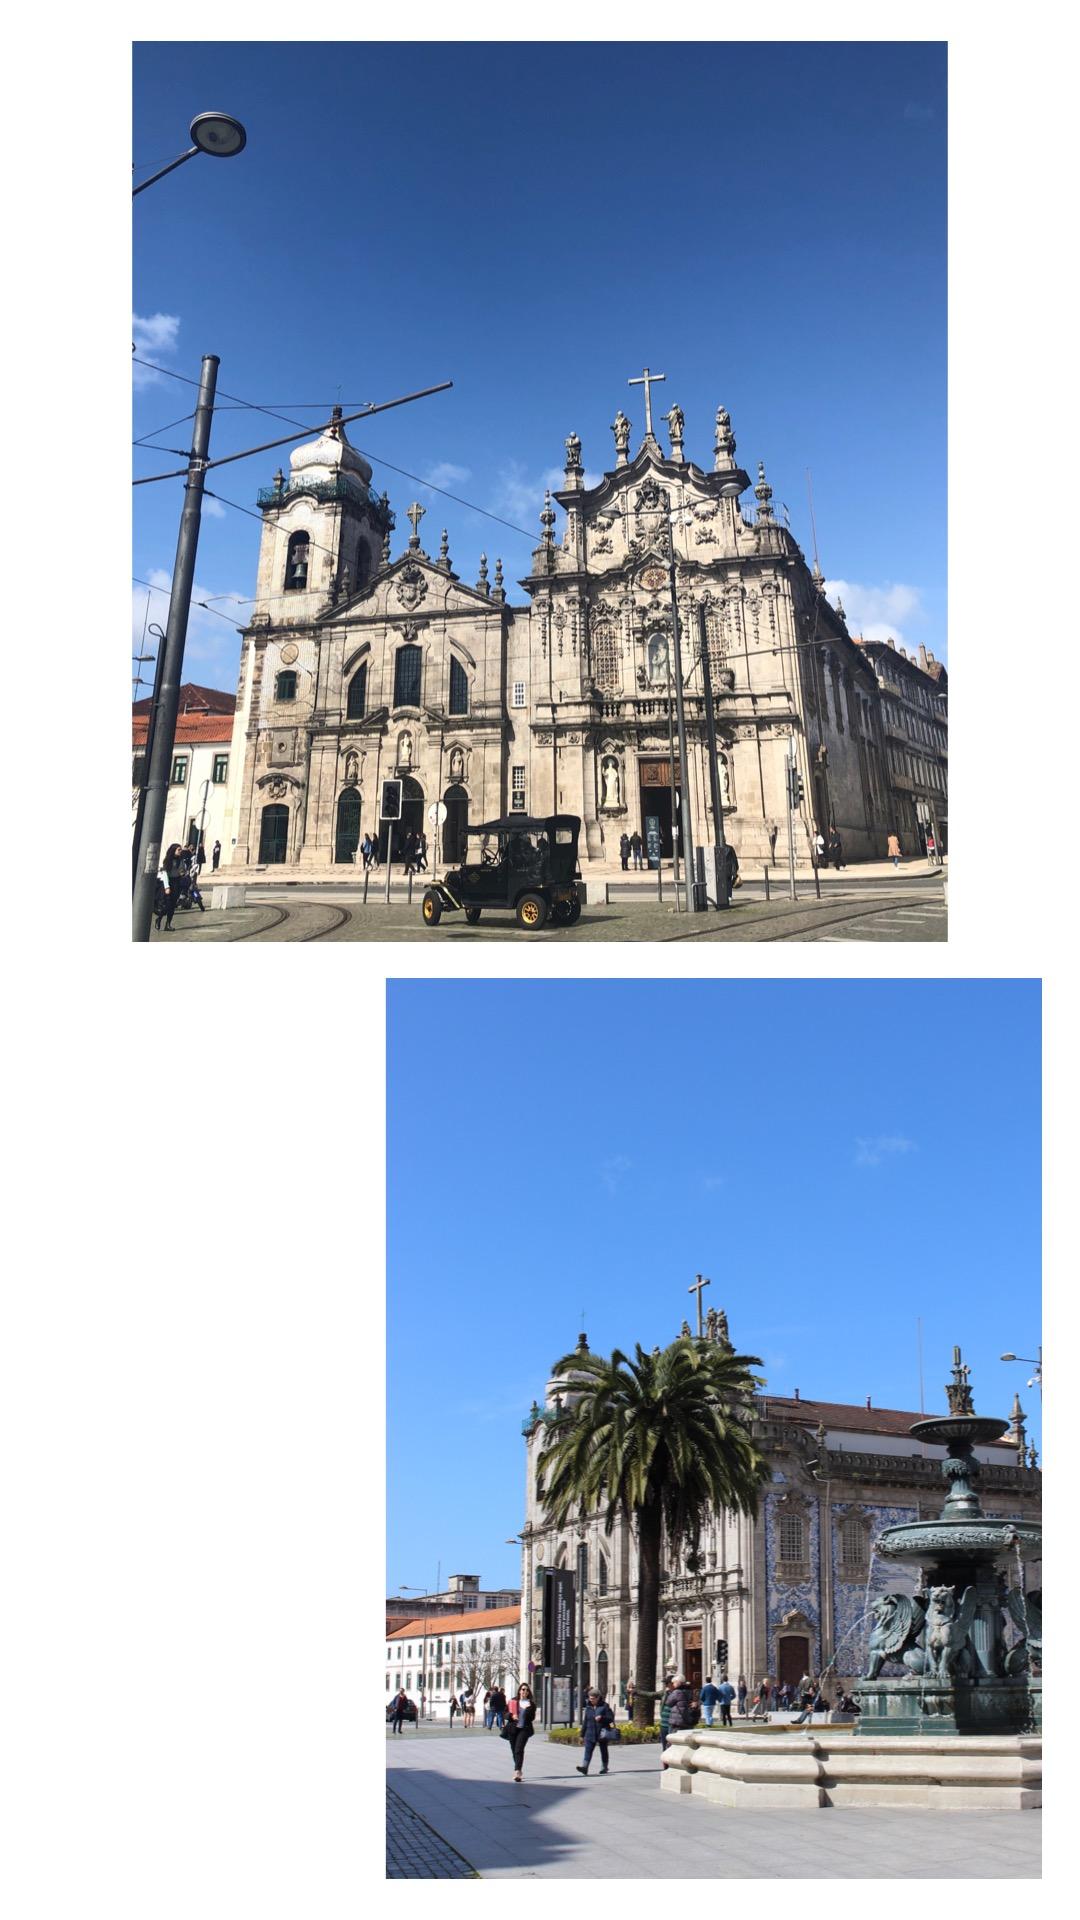 Porto-Reisebericht-Sightseeing-Tipps-Igreja-Carmelitas-Carmo-Zwillingskirchen-Miss-Suzie-Loves